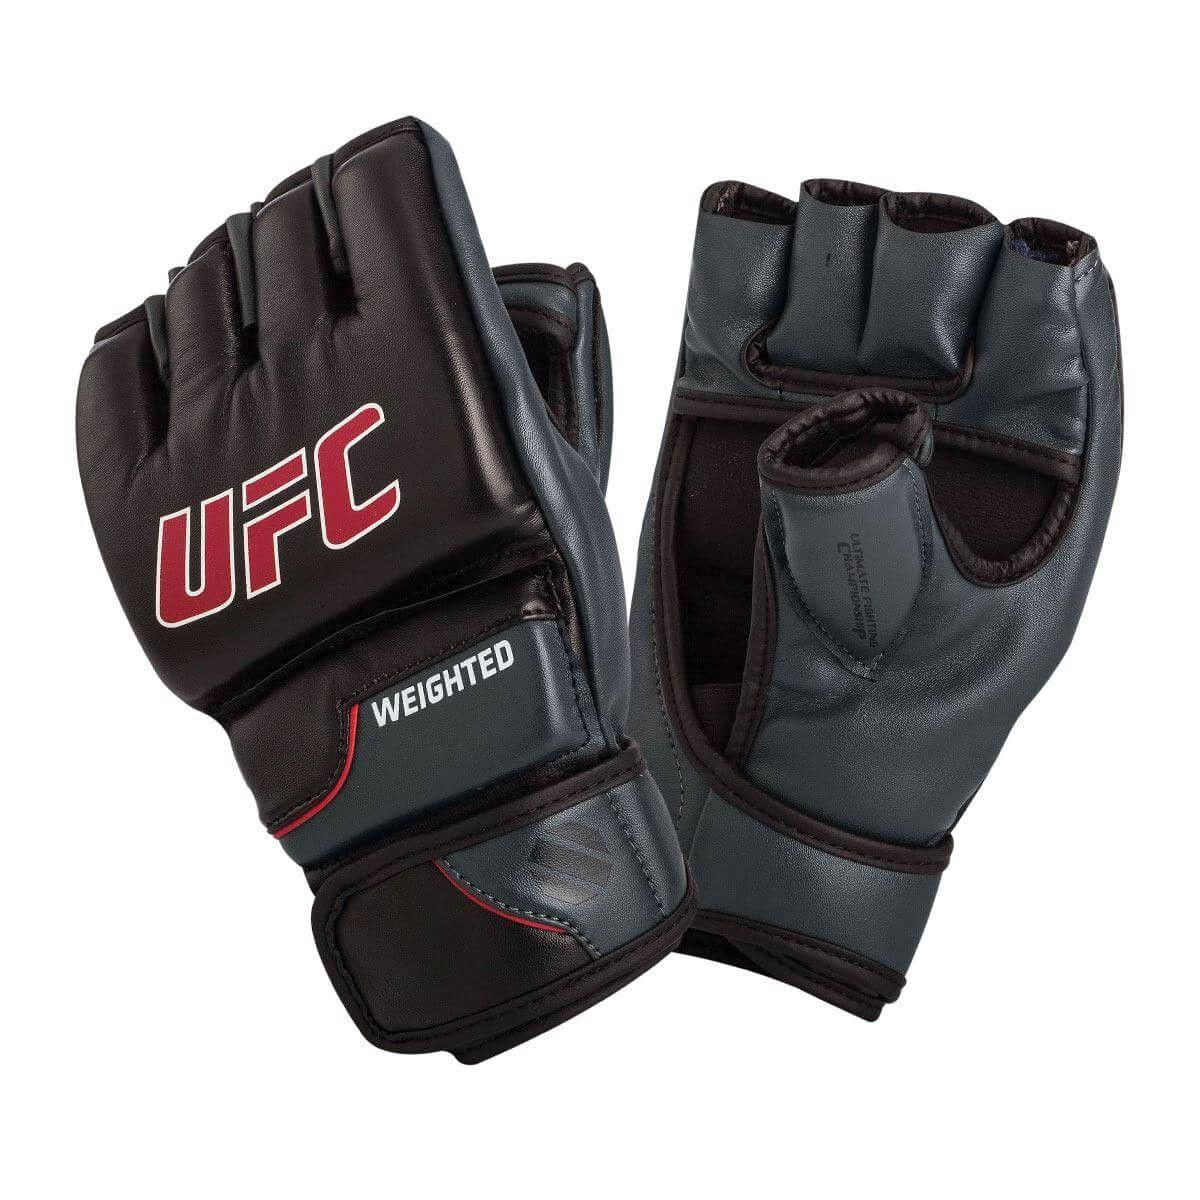 Mma Gloves, Workout Gloves, Ufc